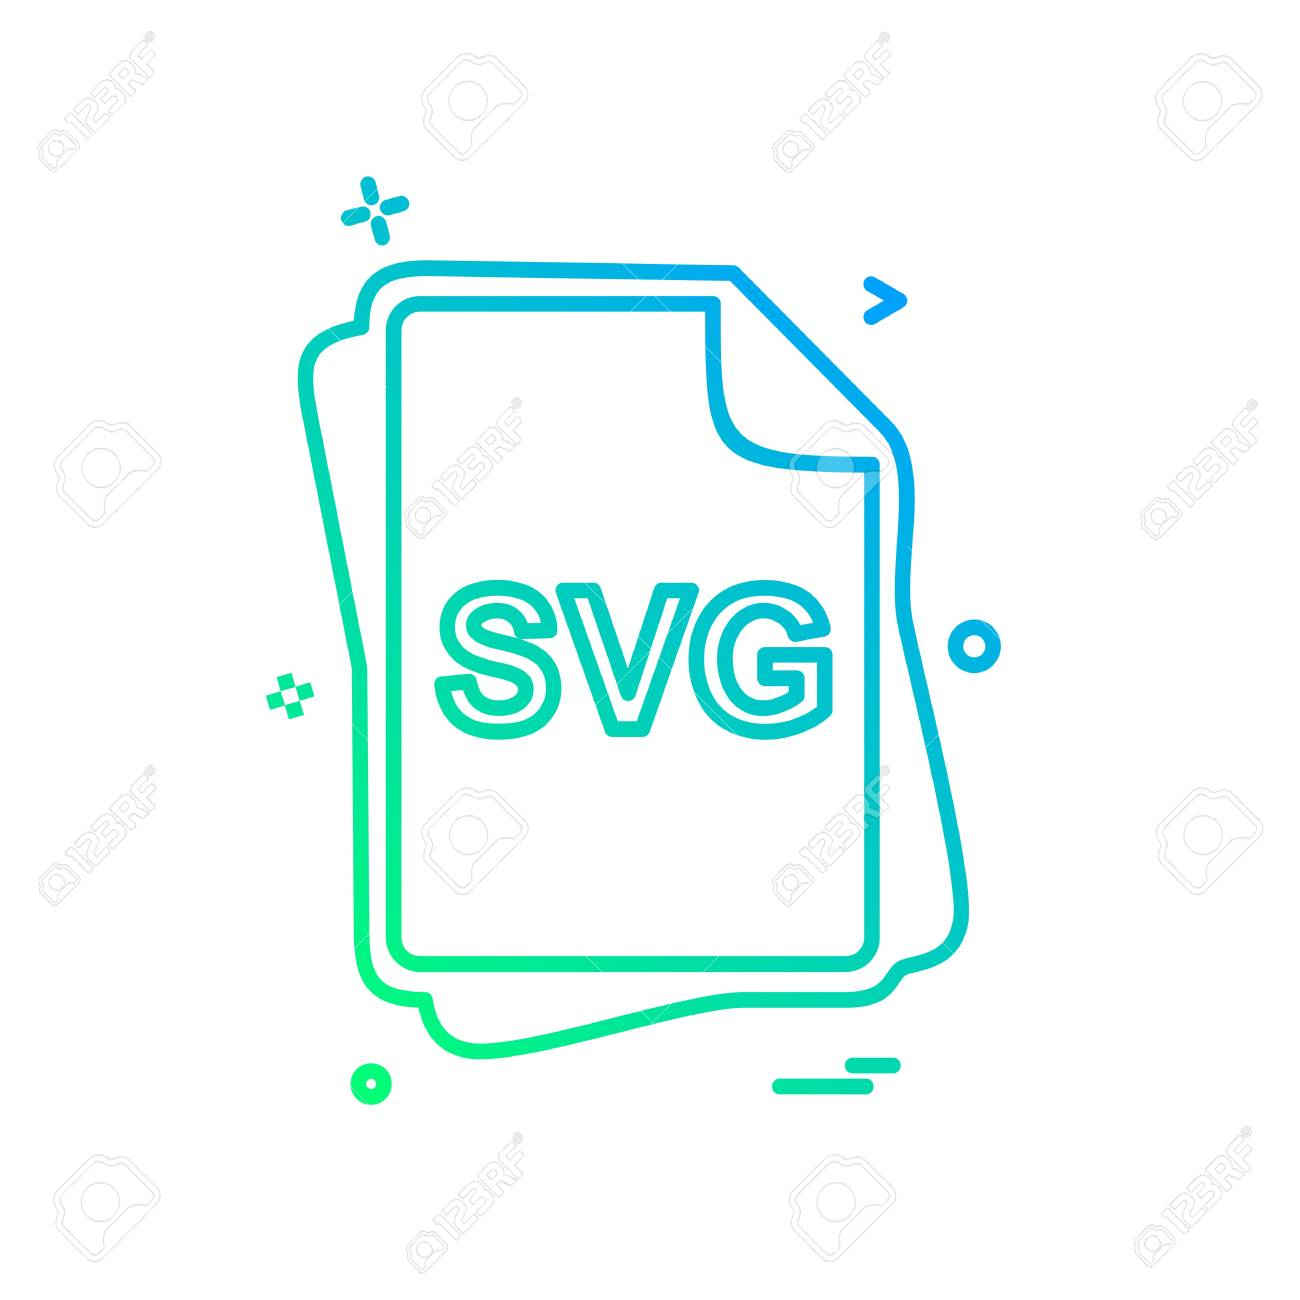 svg filetype #313, Download drawings